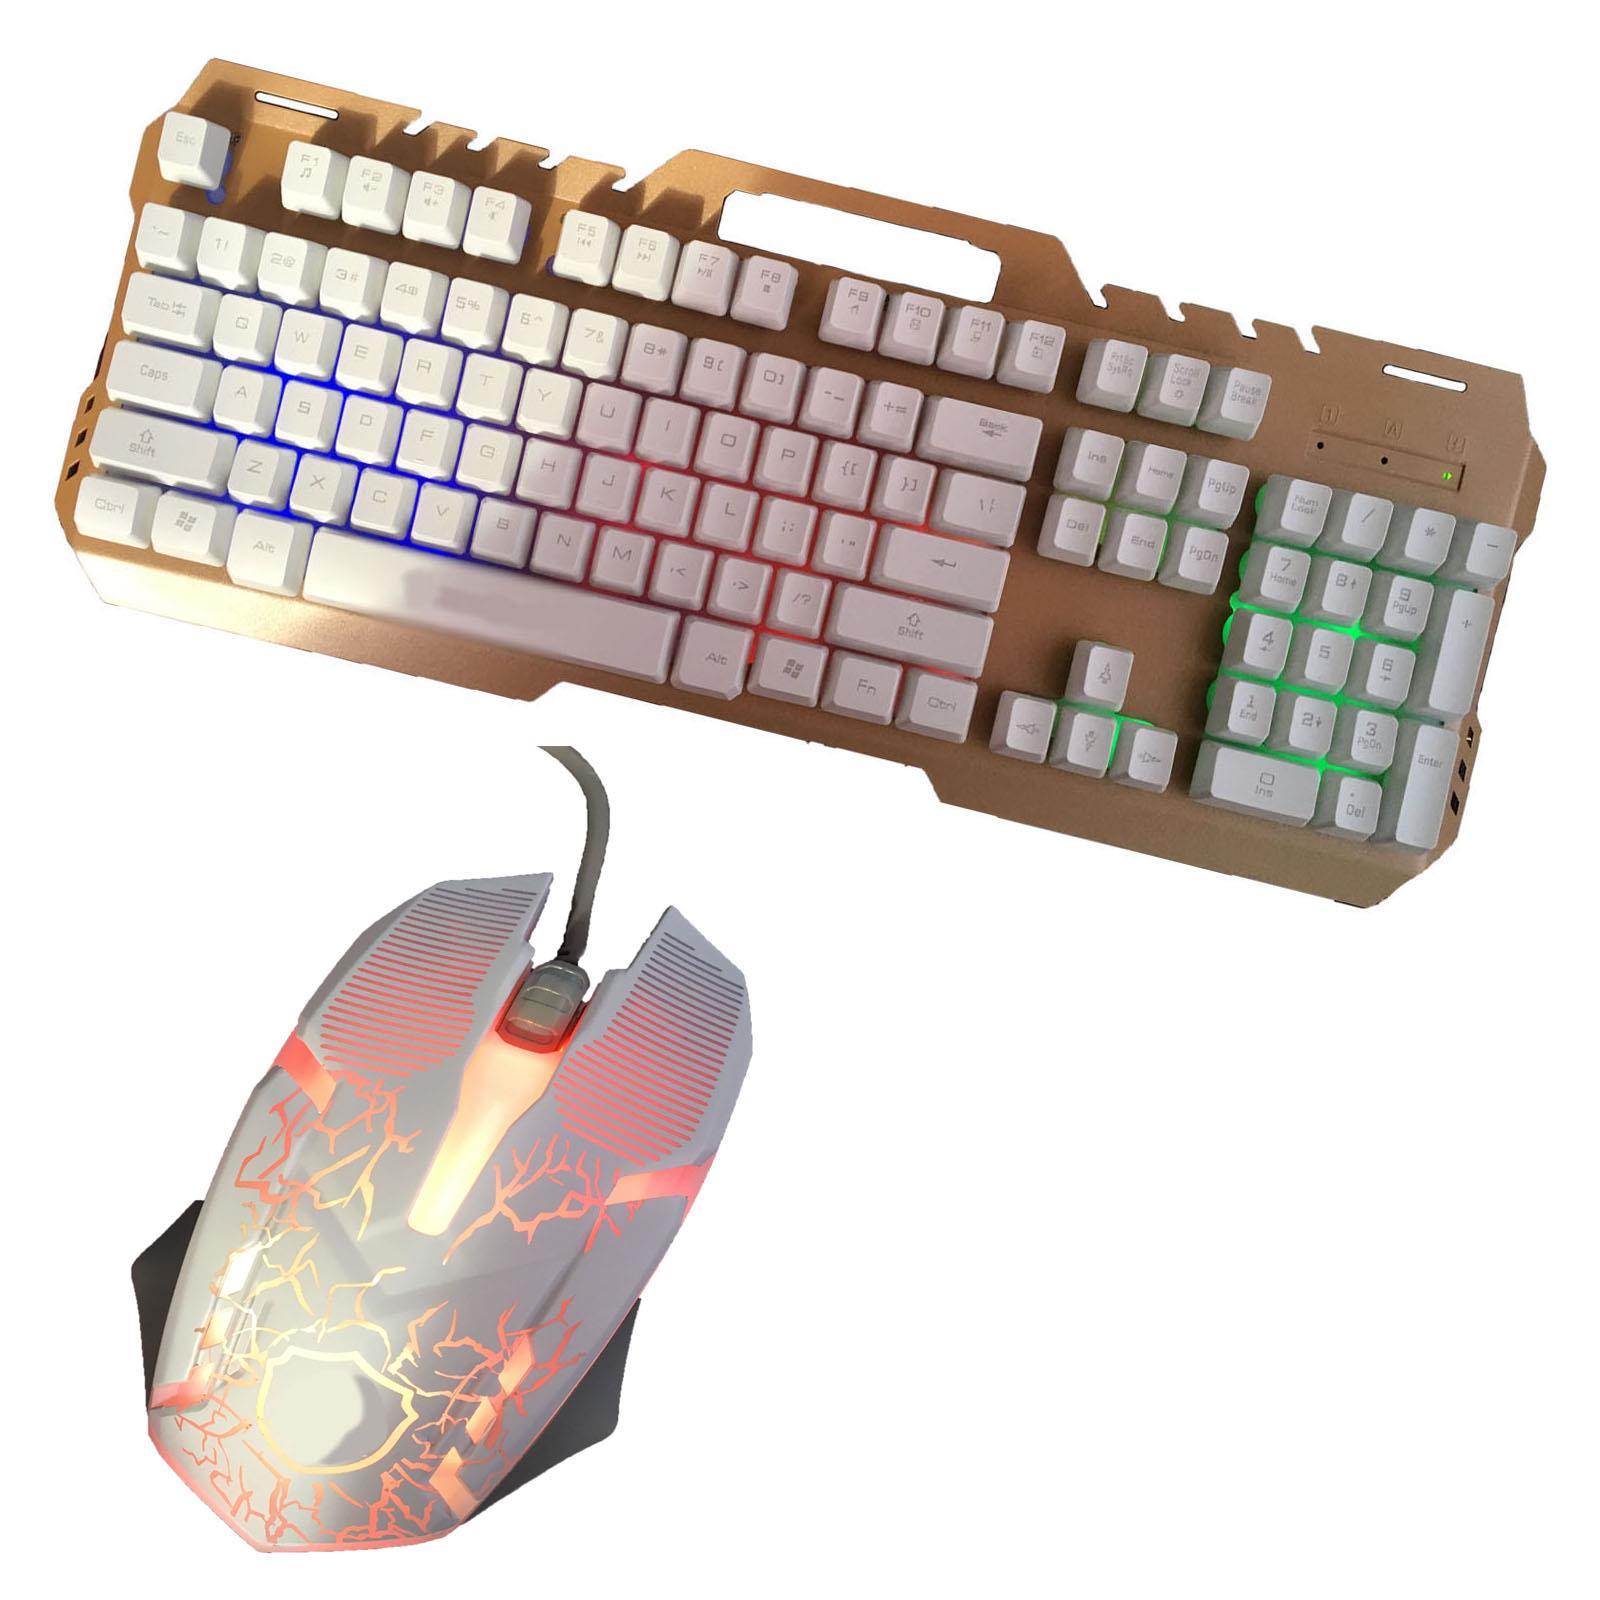 Gaming-Keyboard-Mouse-Backlit-Rainbow-LED-USB-Set-for-PC-Laptop-PS4-Xbox-One thumbnail 53